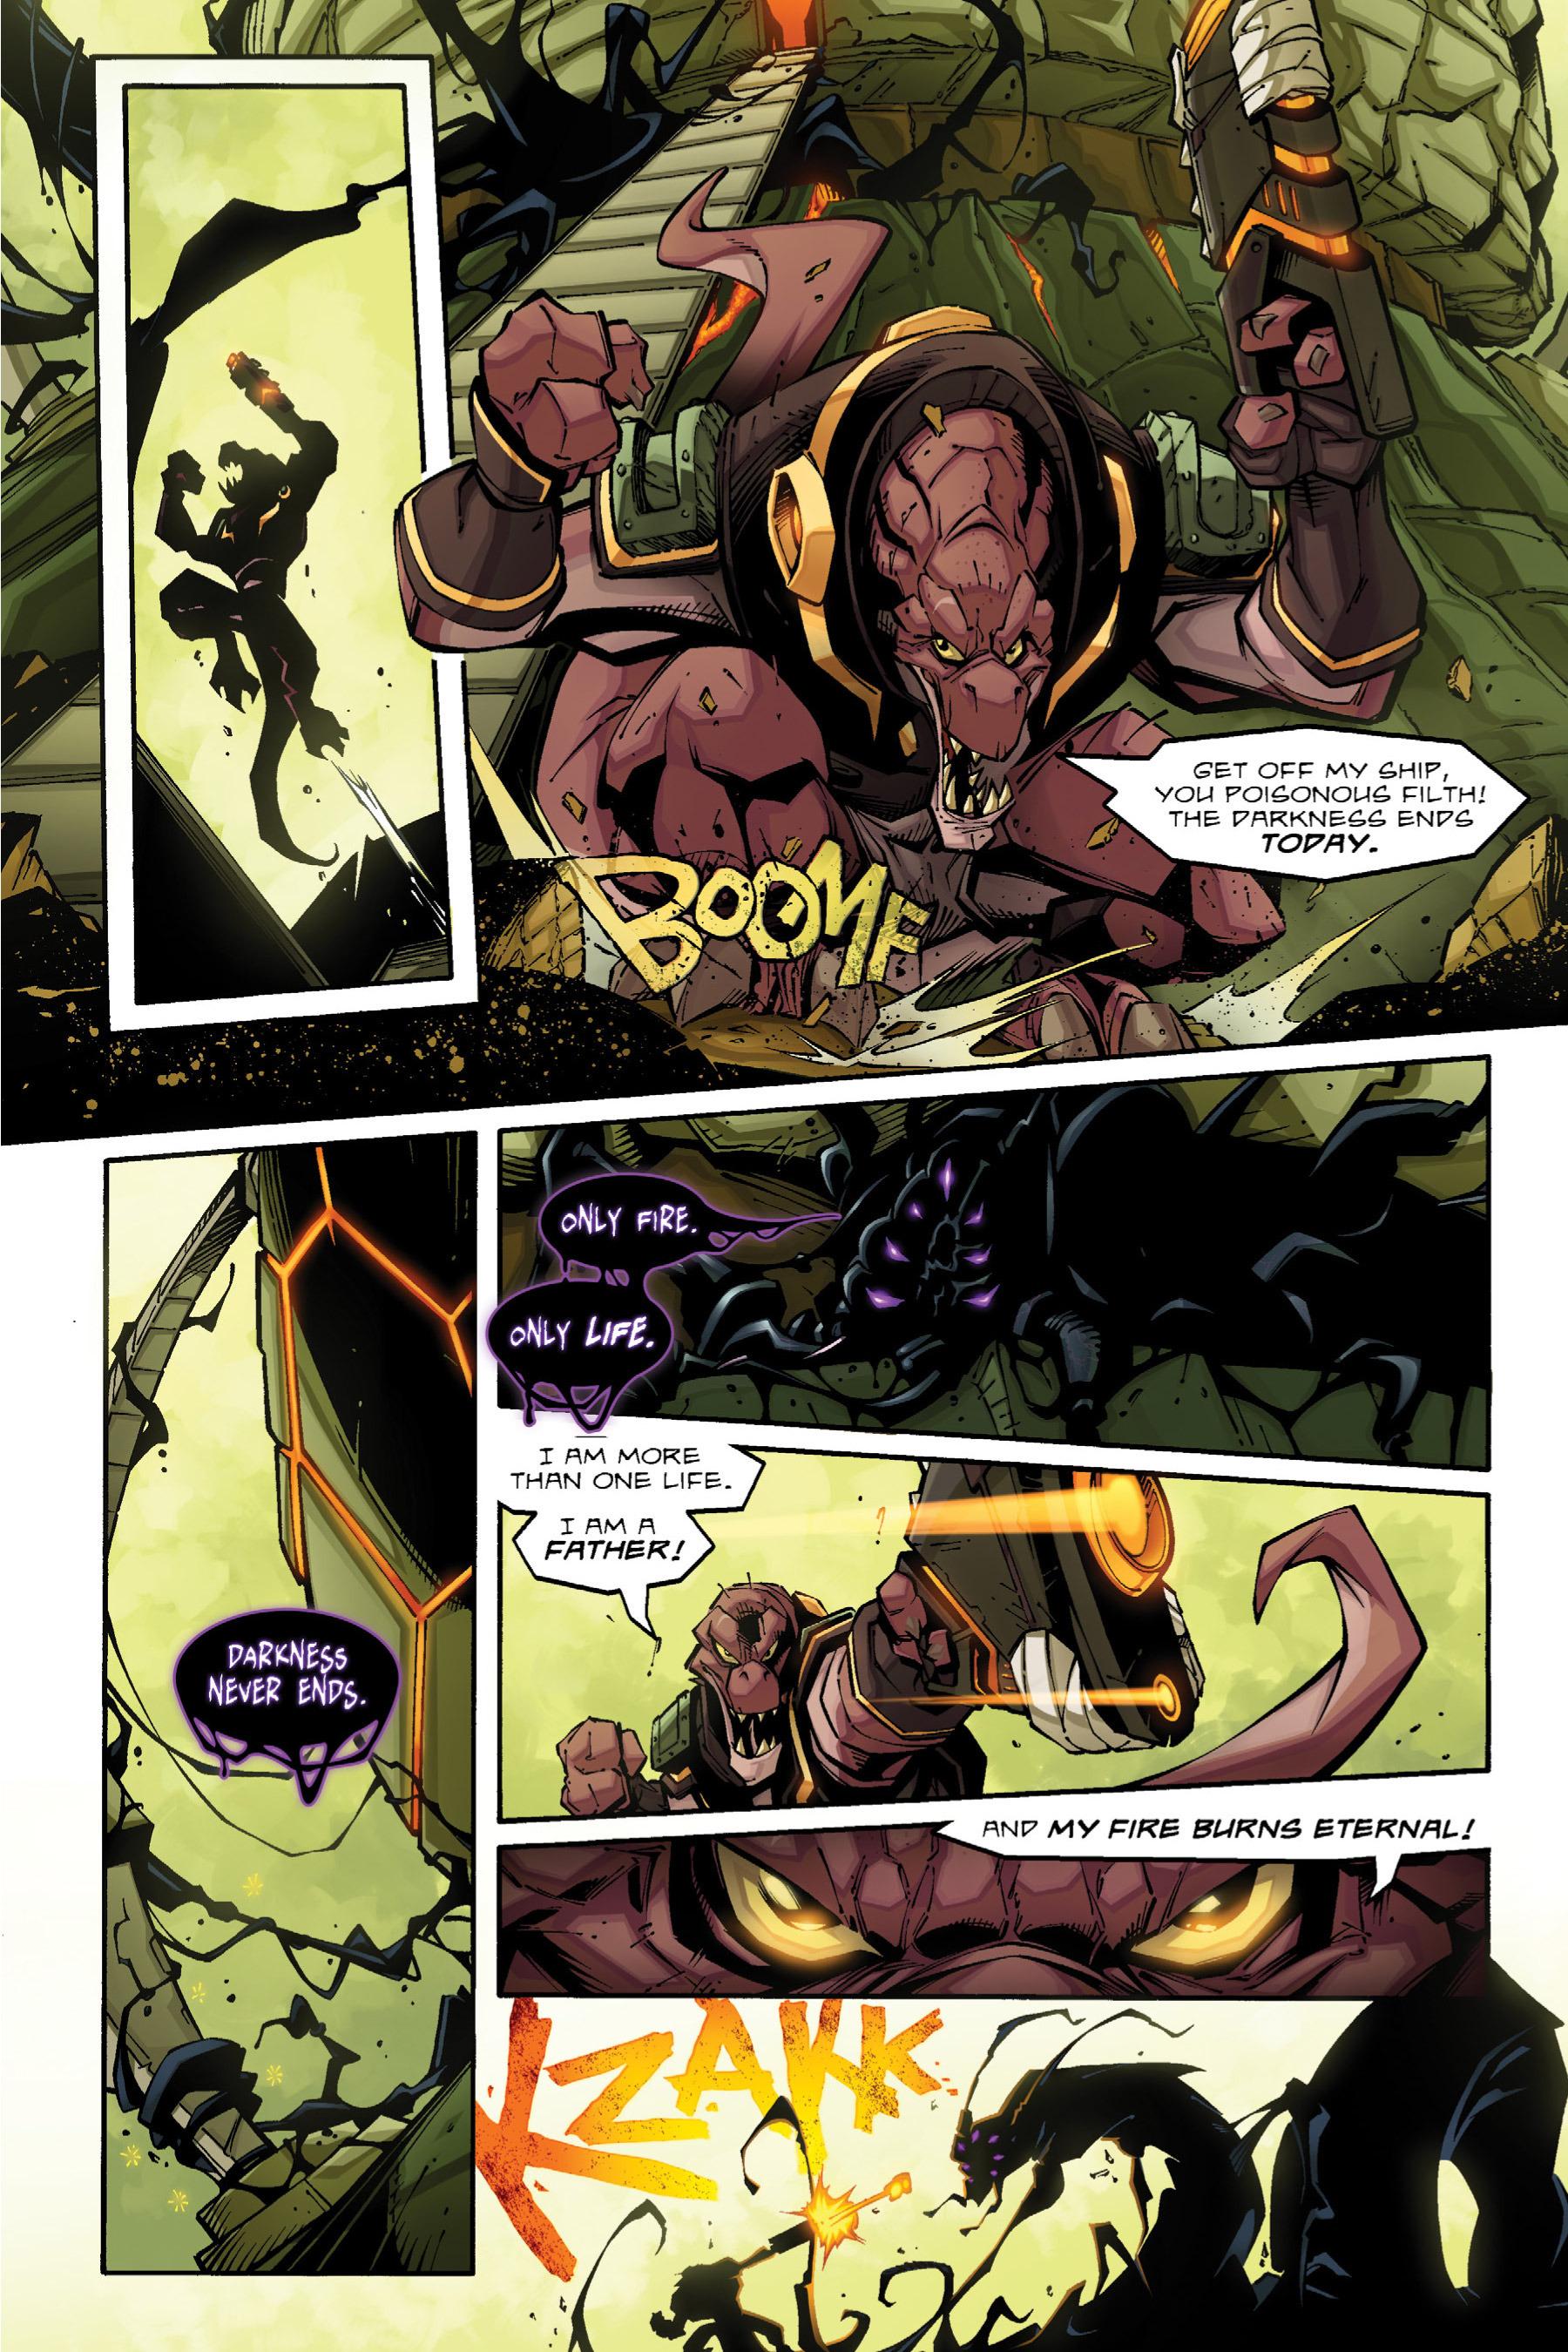 Read online Rexodus comic -  Issue # Full - 13